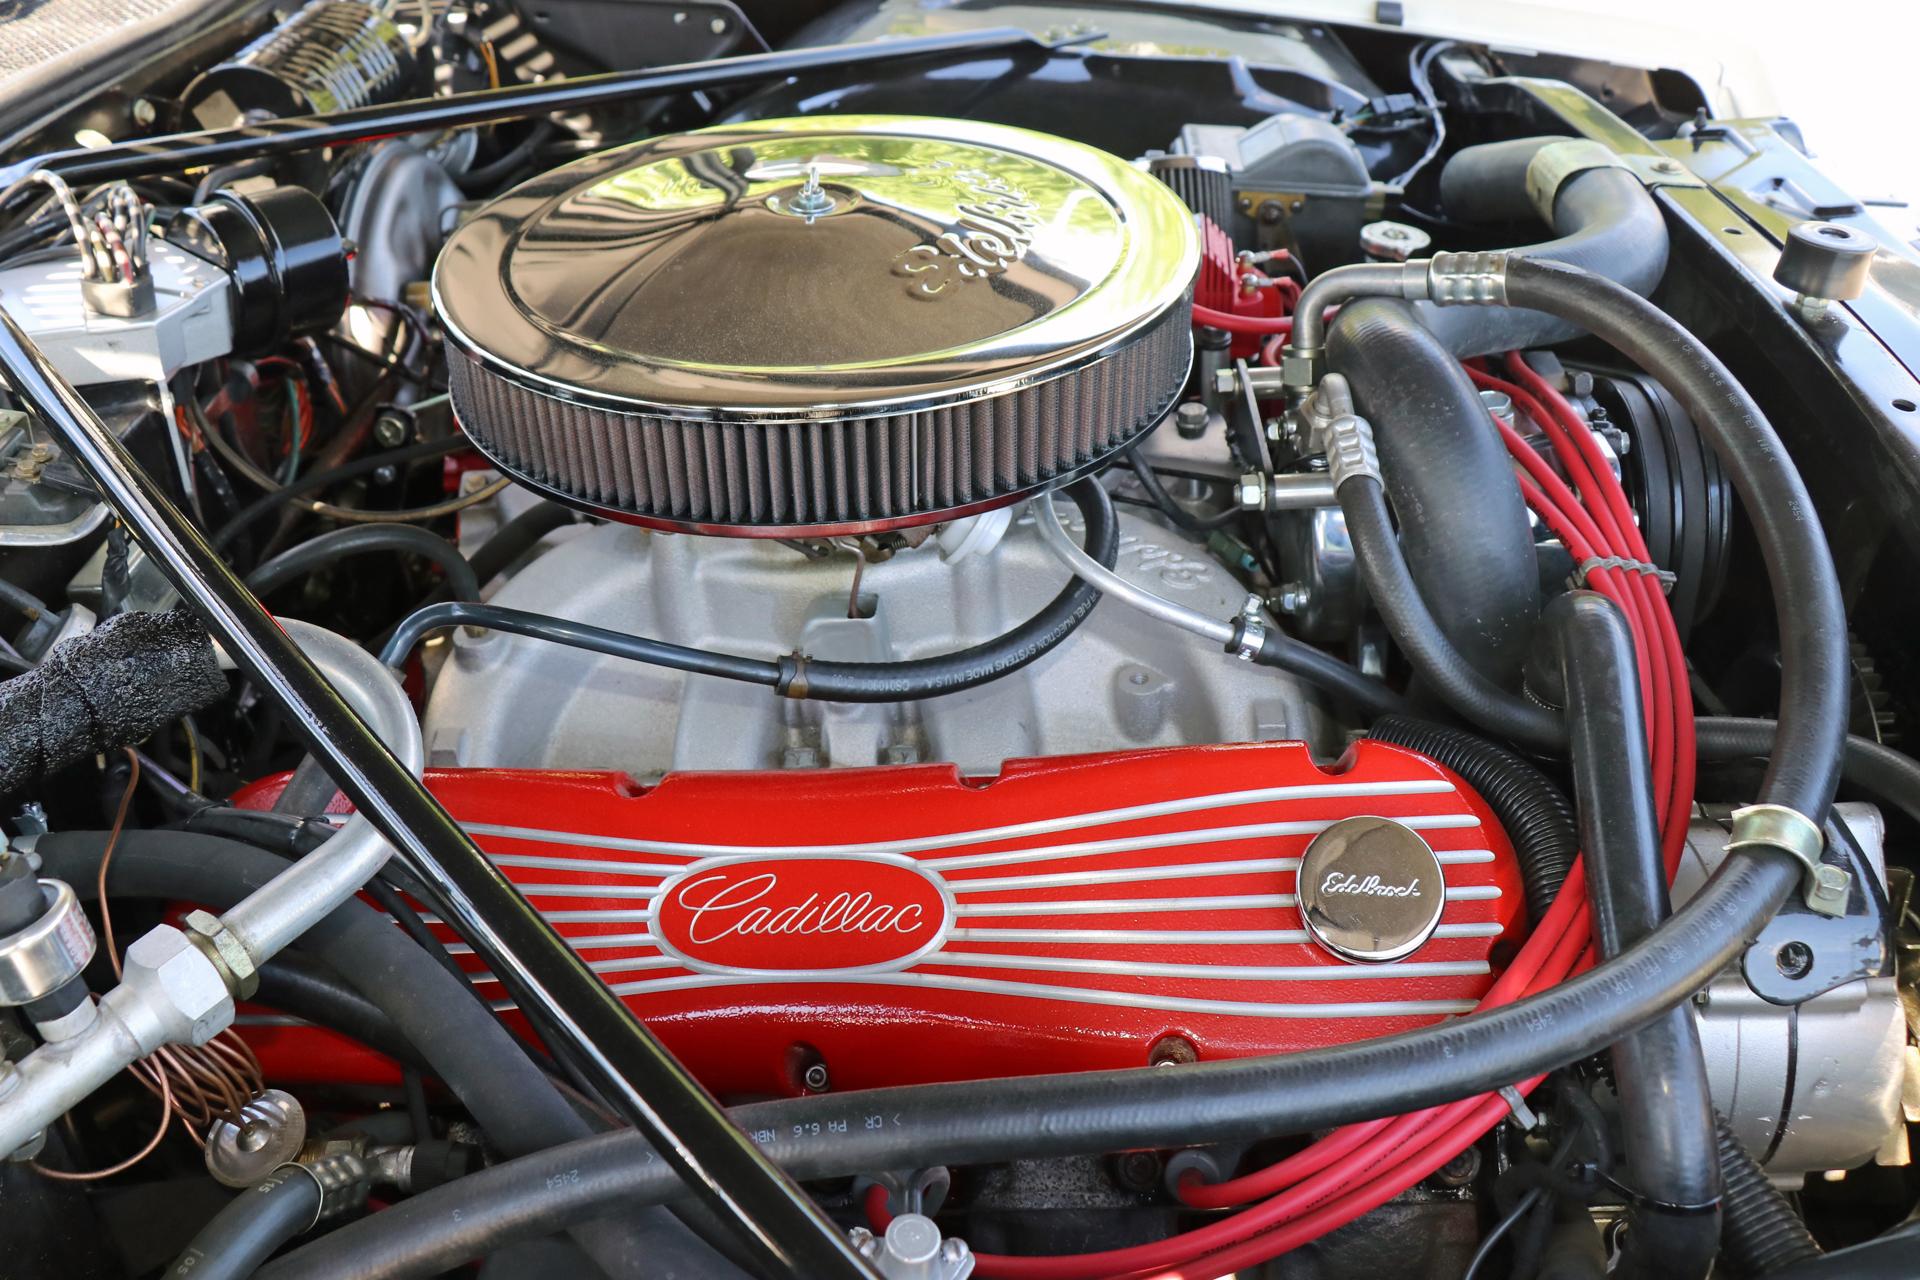 070-1968 Cadillac DeVille convertible 06. Eiere, 0